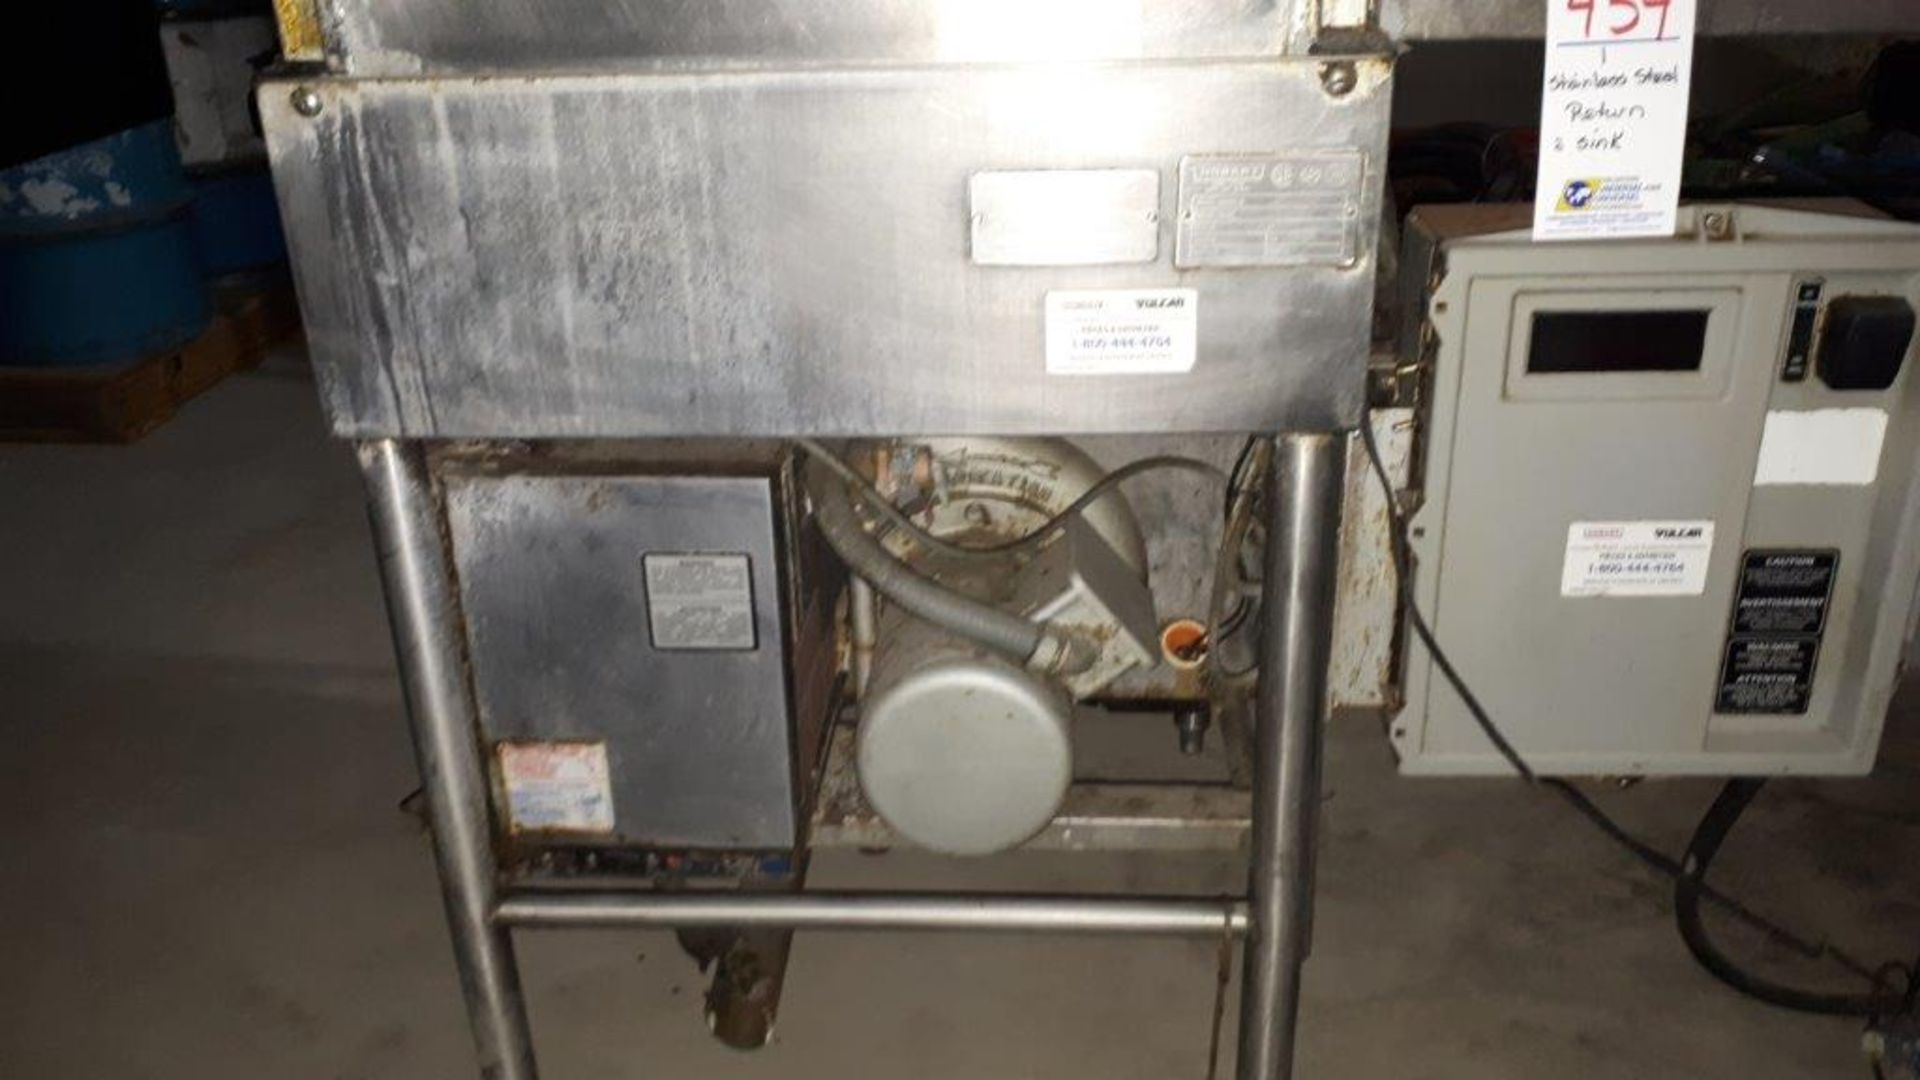 Hobart stainless steel dishwasher, model: AM14 - Image 3 of 7